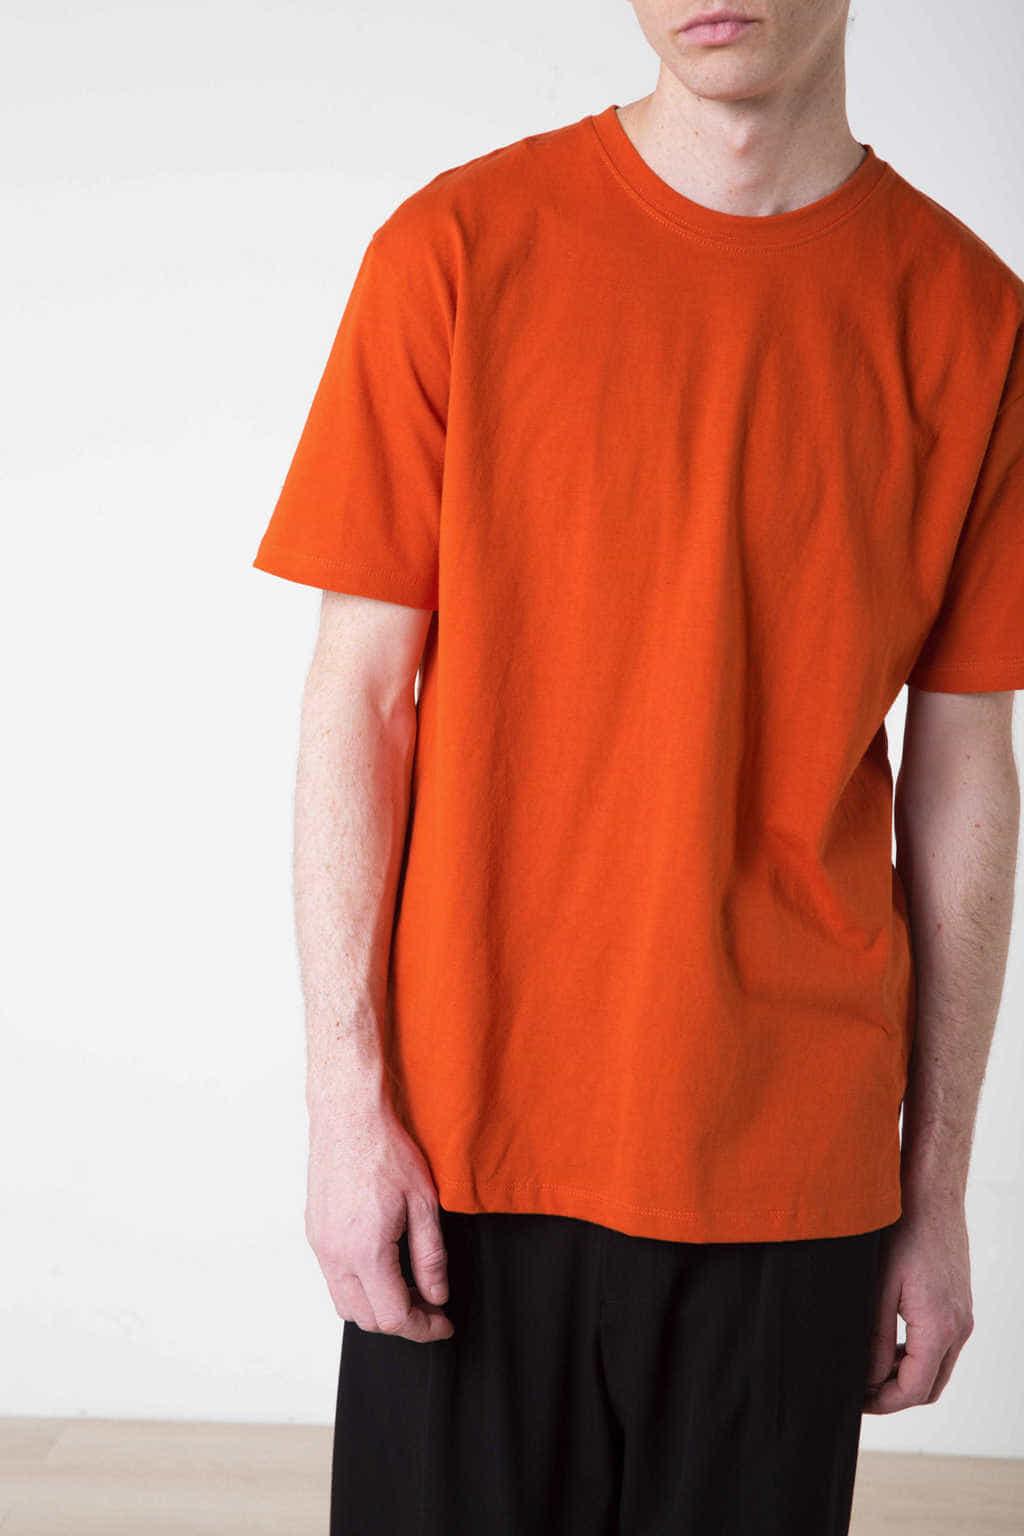 TShirt H134 Orange 2